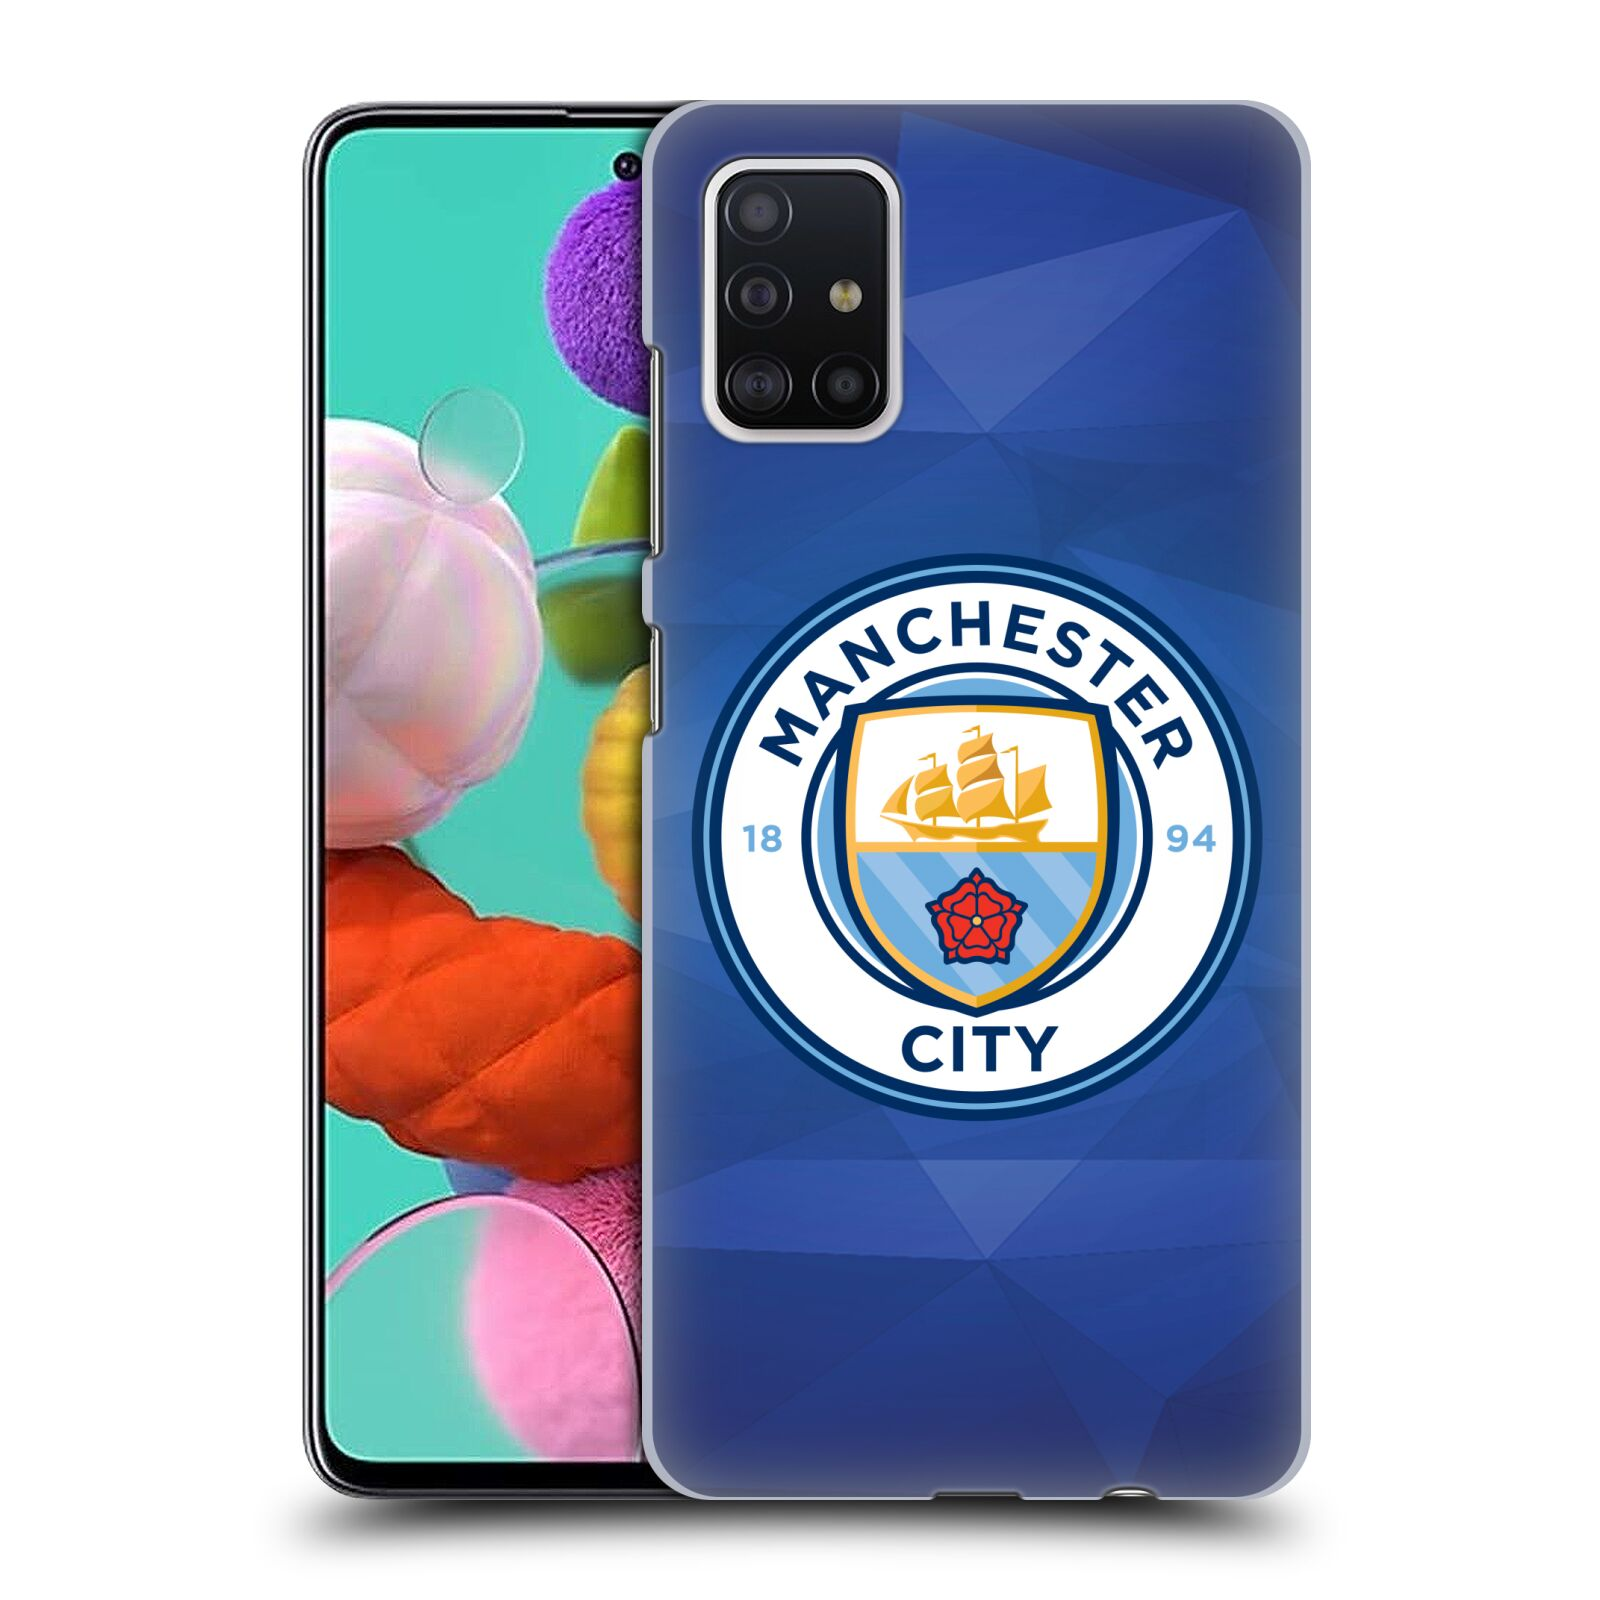 Plastové pouzdro na mobil Samsung Galaxy A51 - Head Case - Manchester City FC - Modré nové logo